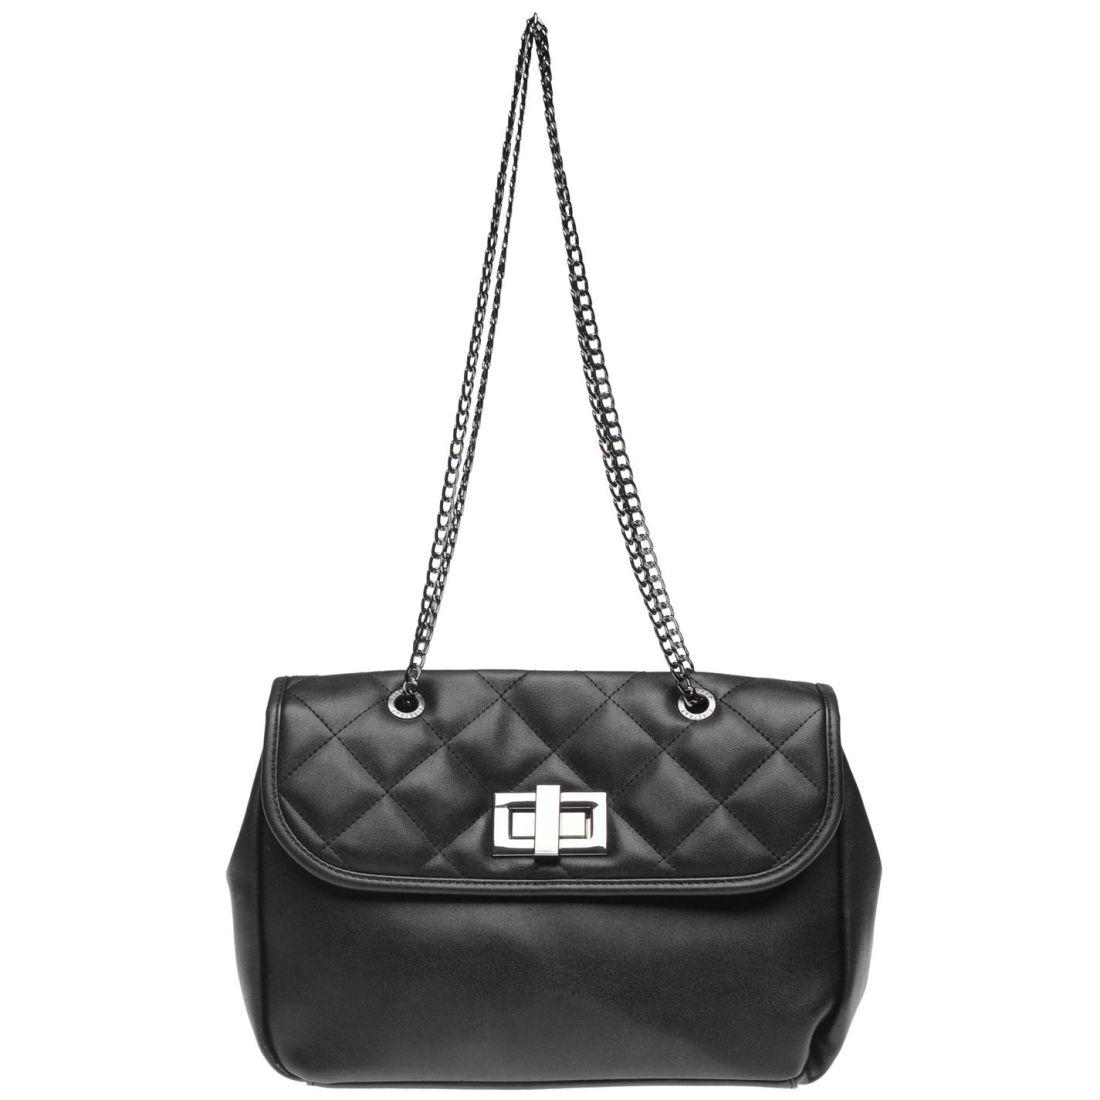 079e22e503d6 Details about Firetrap Handbag Ladies Hand Bag Case Sack Holdall Zip Quilted